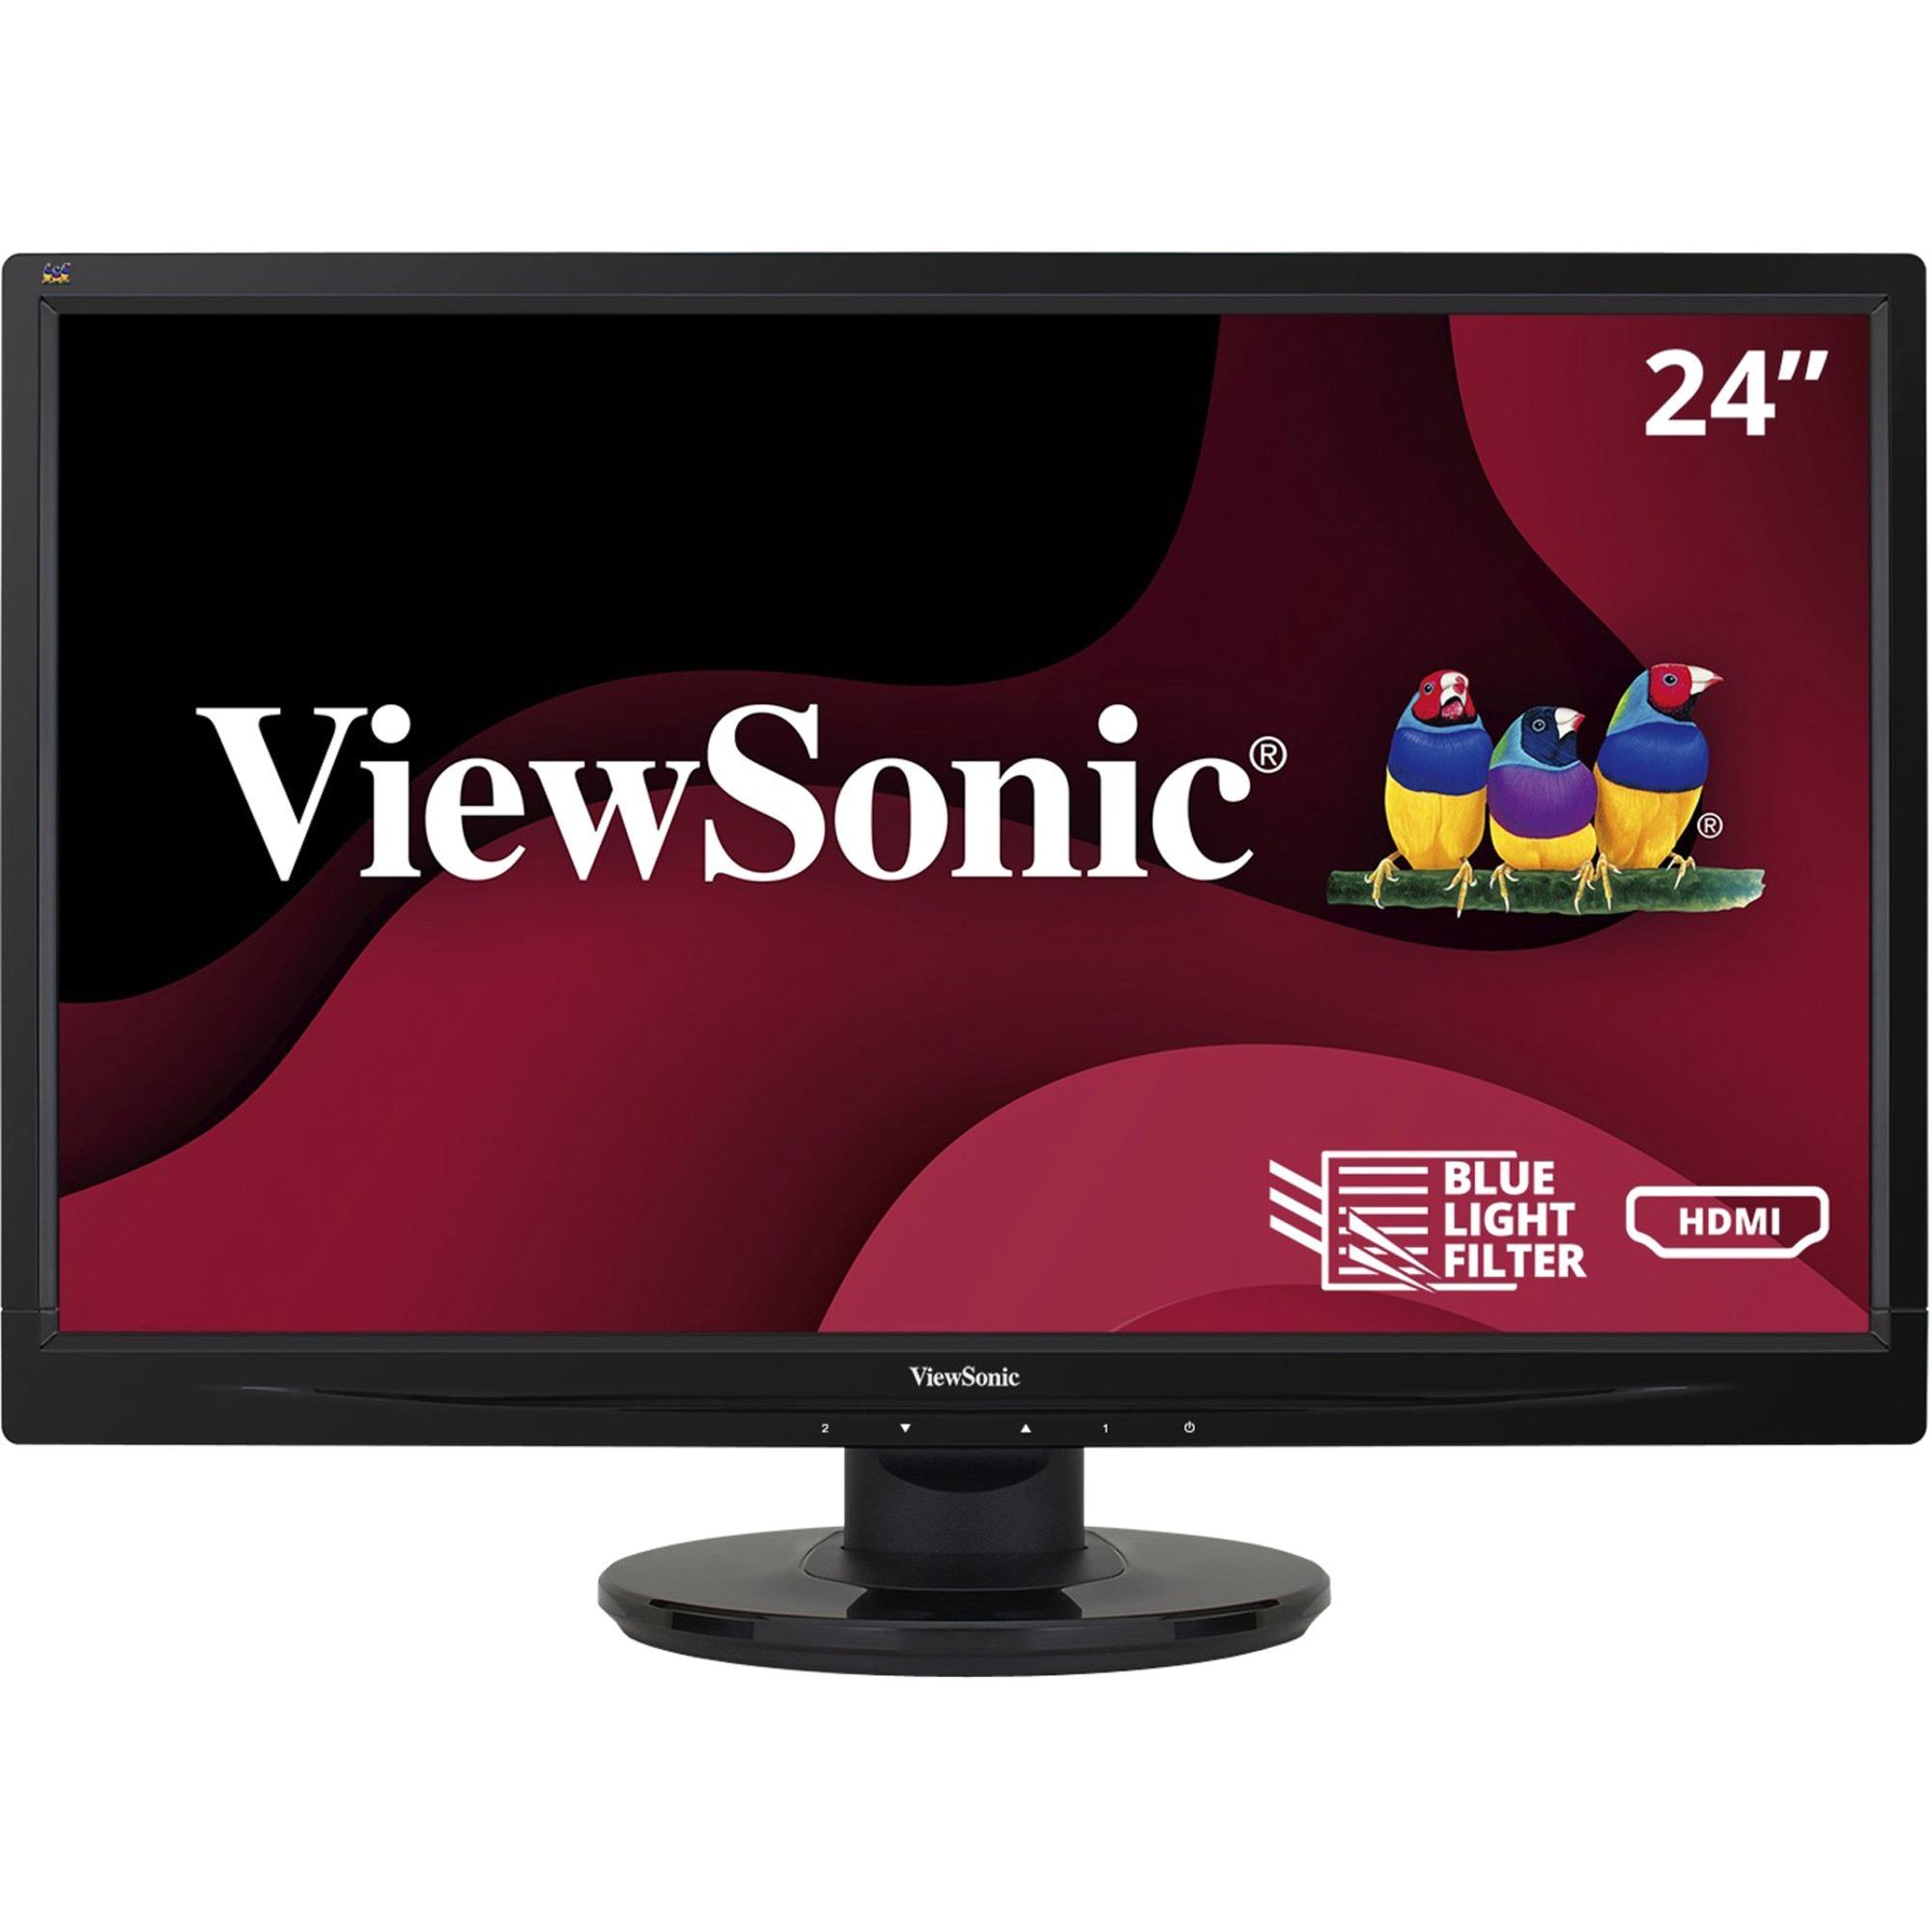 "Viewsonic VA2446MH-LED 24"" Full HD WLED LCD Monitor - 16:9 - Black_subImage_1"